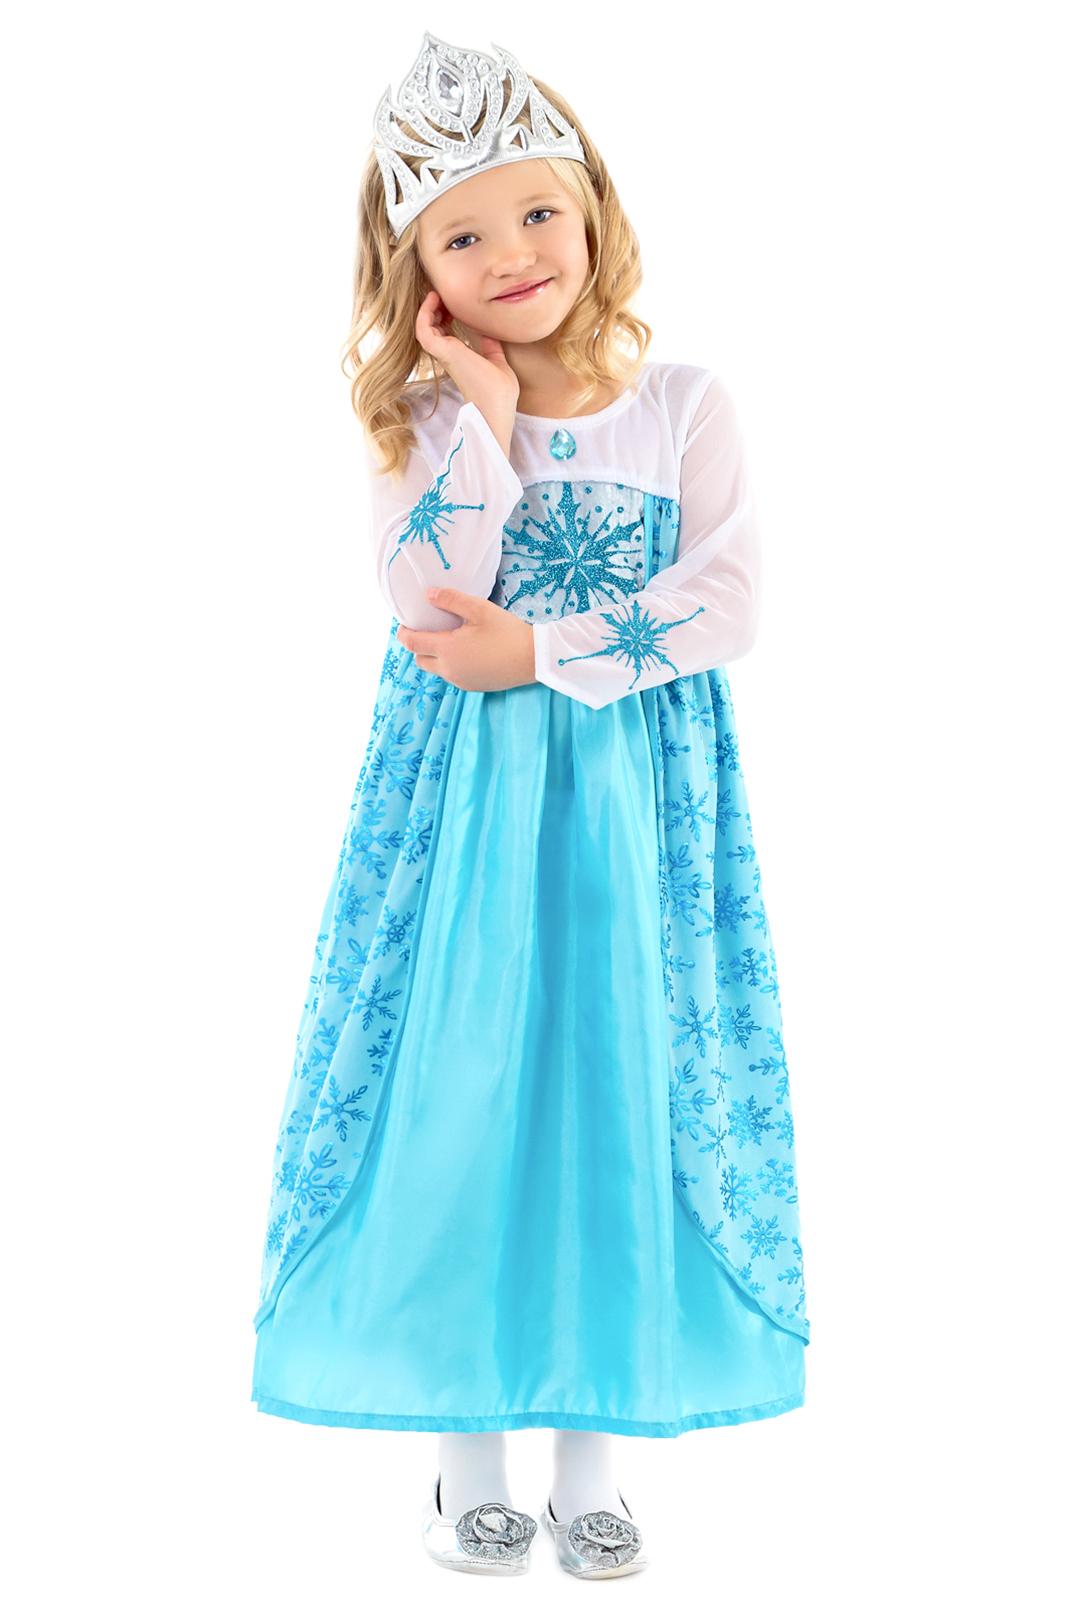 Elsa Ice Princess Set Costume Gloves Crown Plait Elsa New